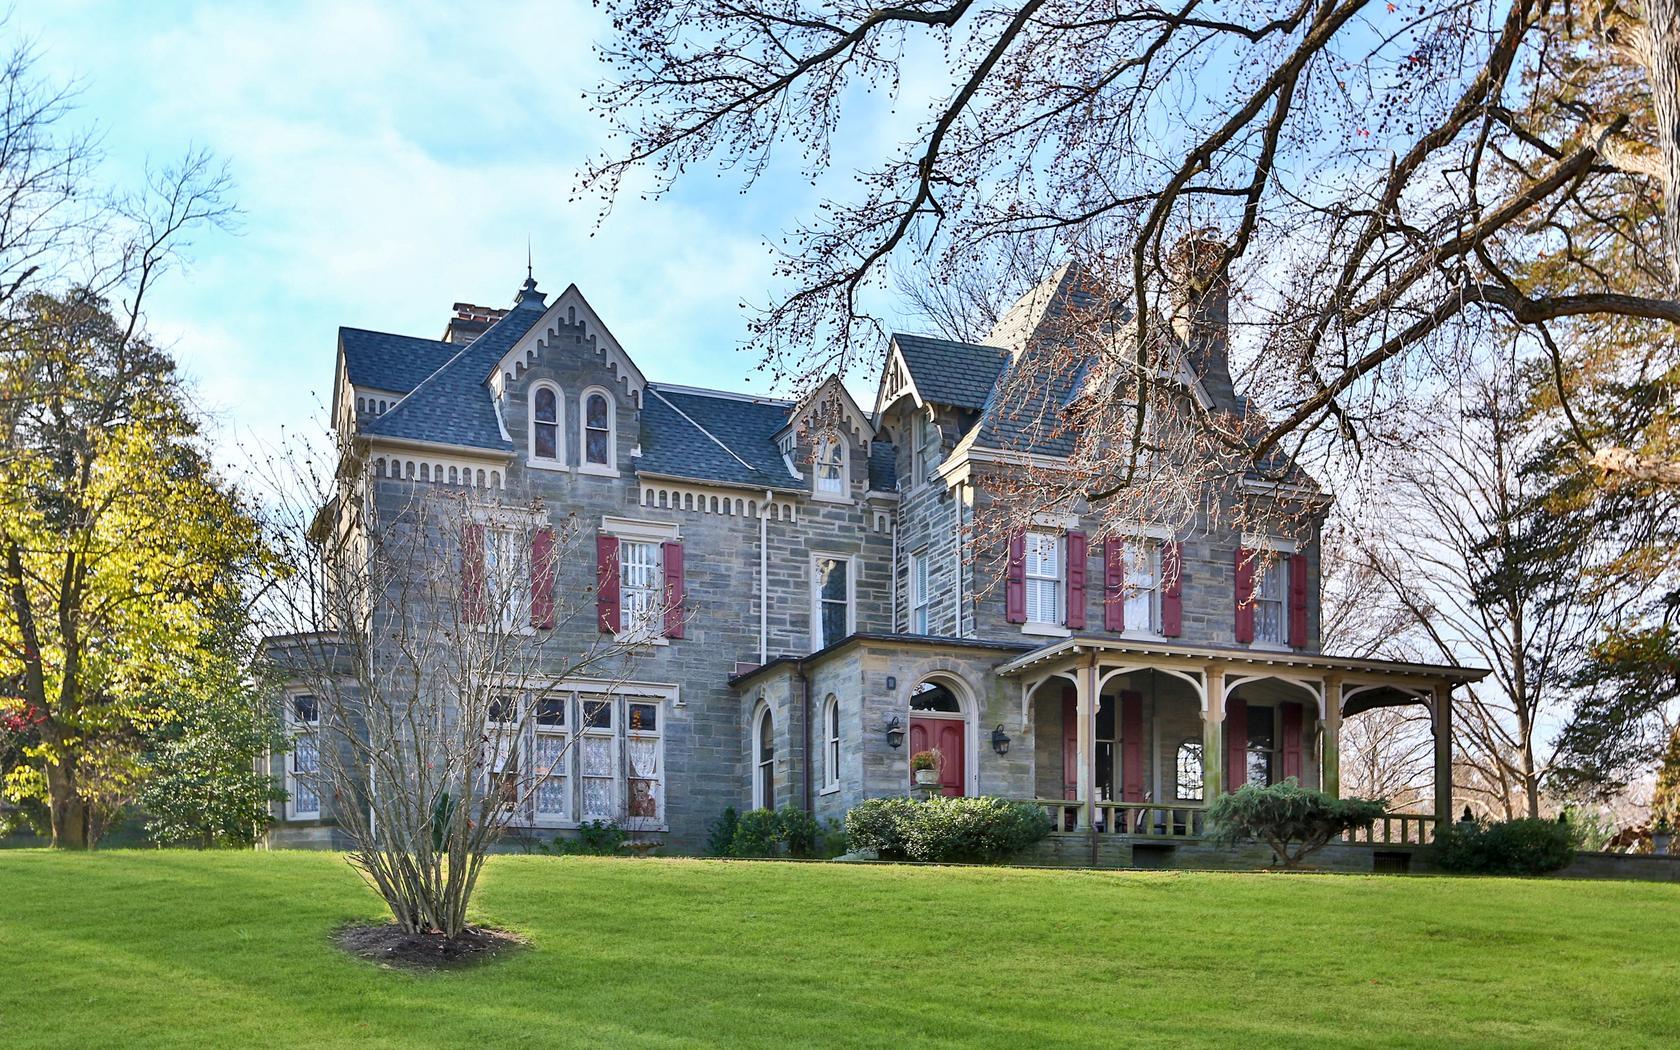 Elegant Victorian Chestnut Hill Mansion Now 195K Cheaper